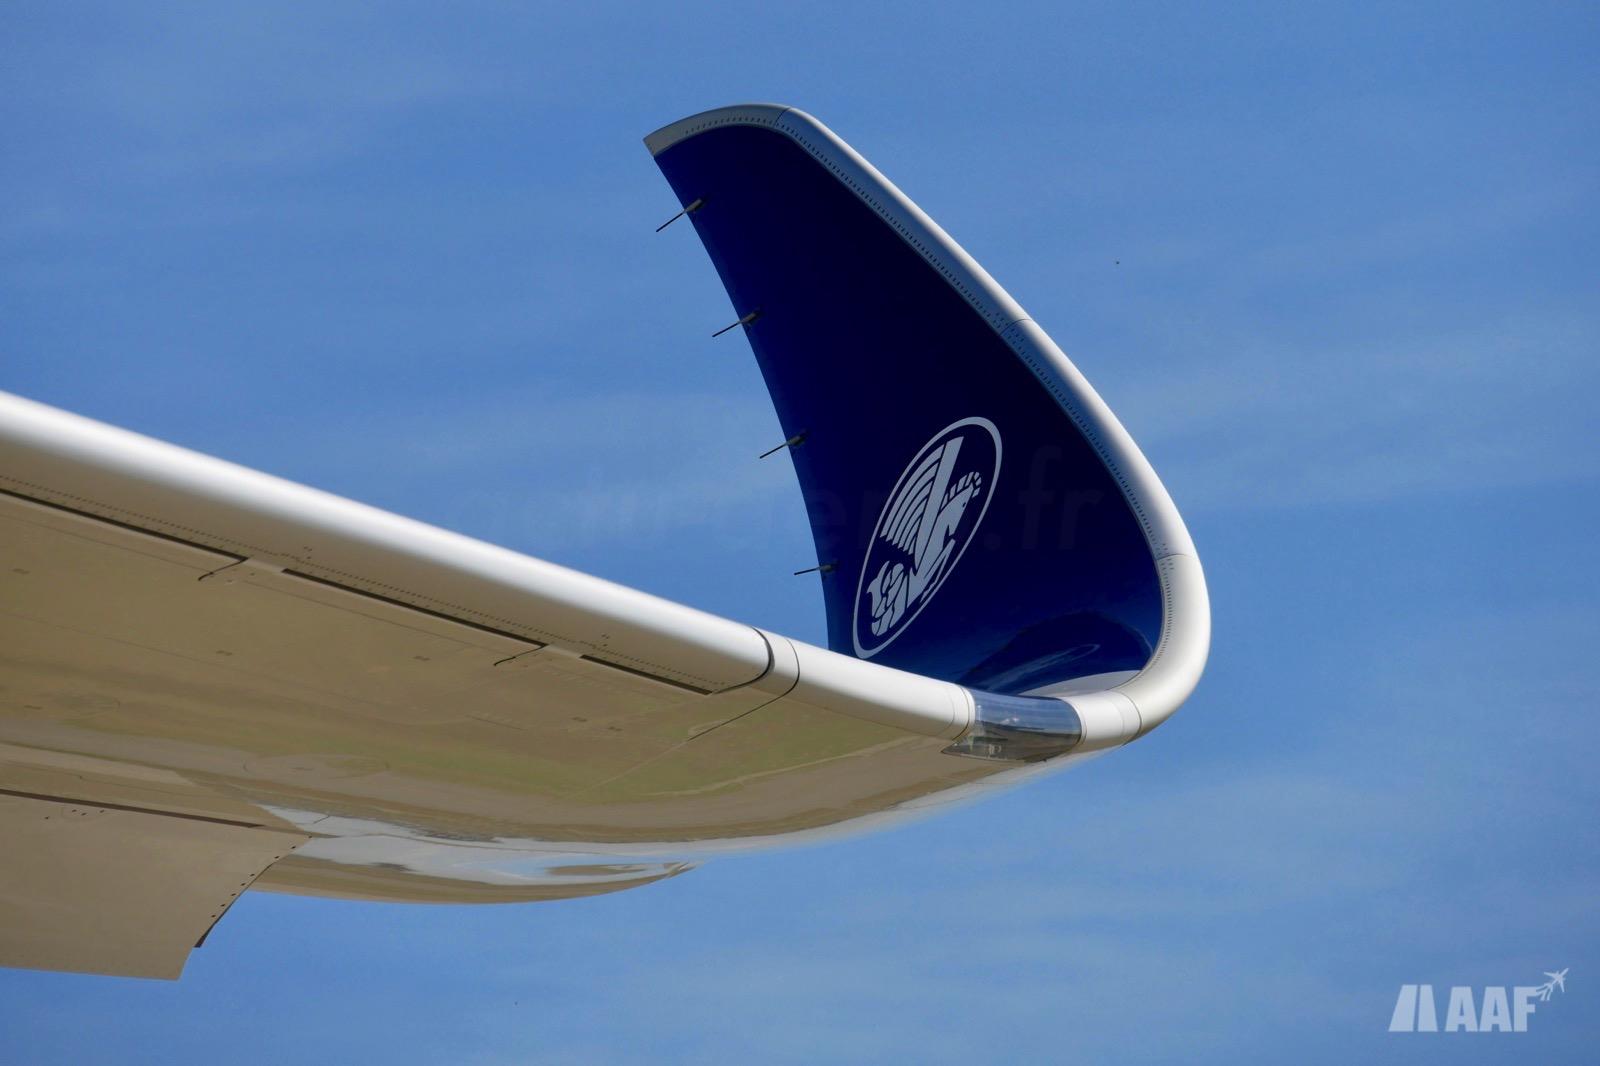 1er A350-900 Air France [F-HTYA / MSN331 / F-WZFN] © AAF - reproduction interdite